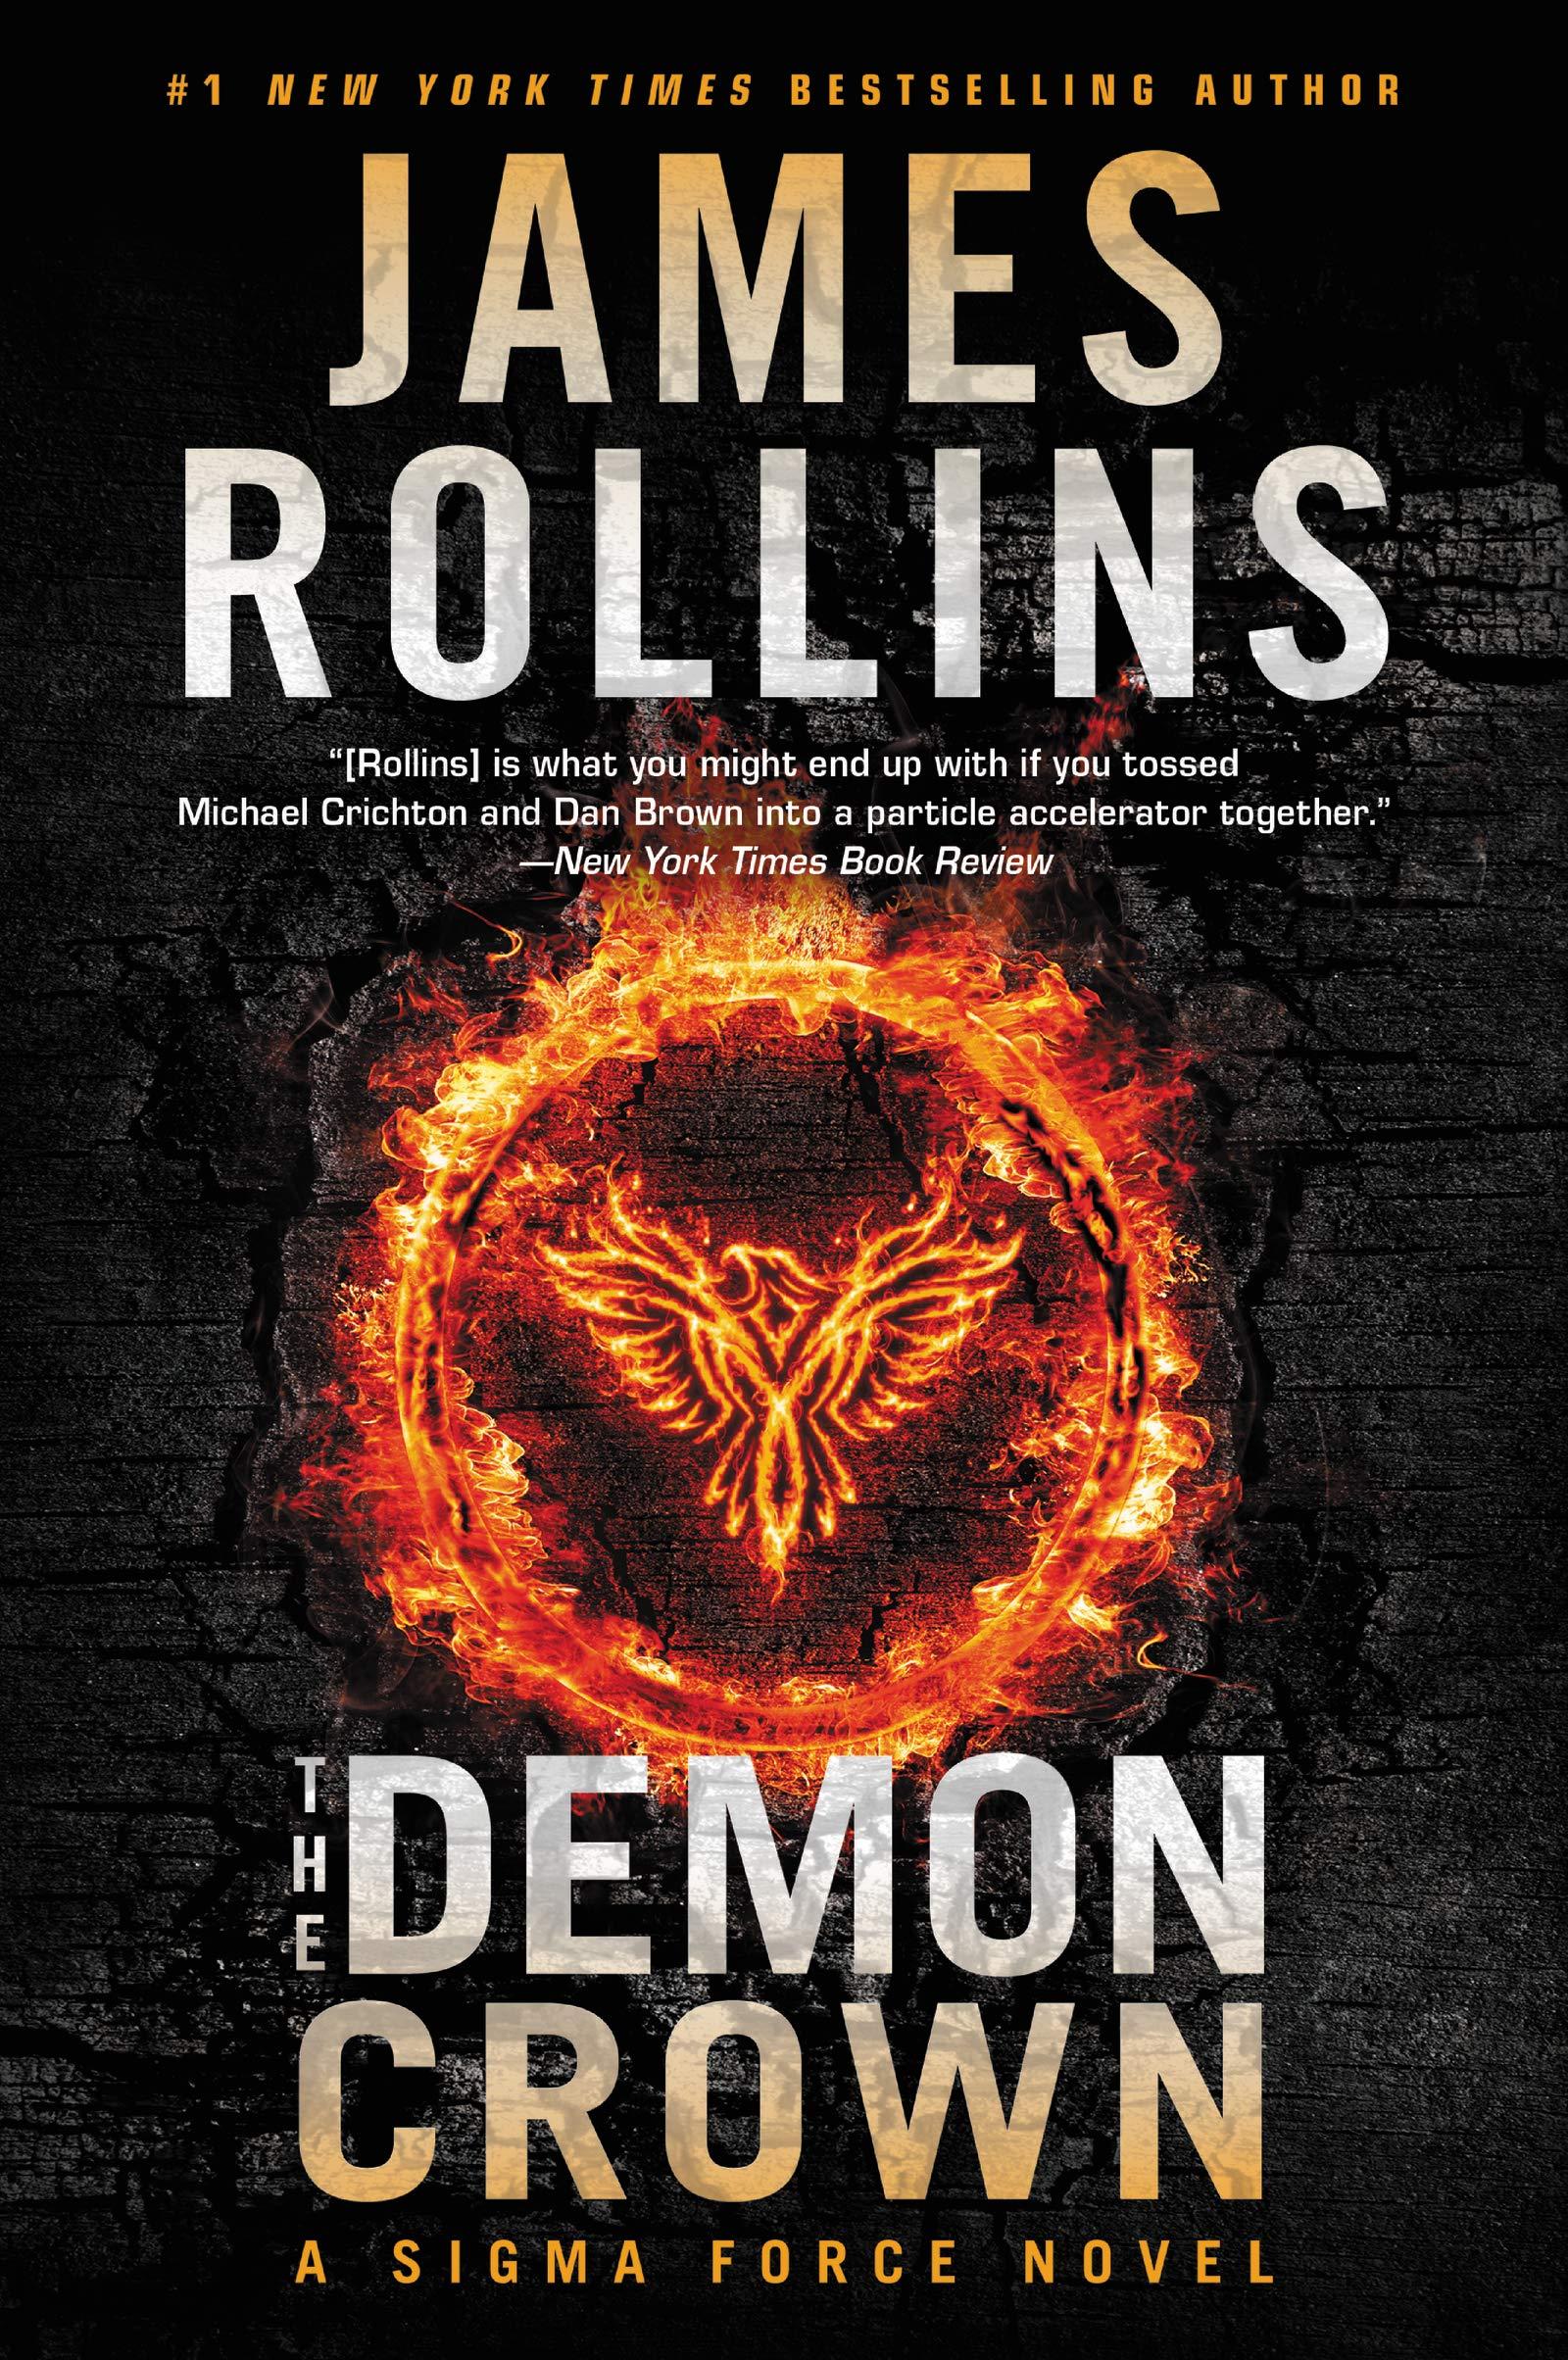 Amazon.com: The Demon Crown: A Sigma Force Novel (Sigma Force Novels)  (9780062869524): James Rollins: Books